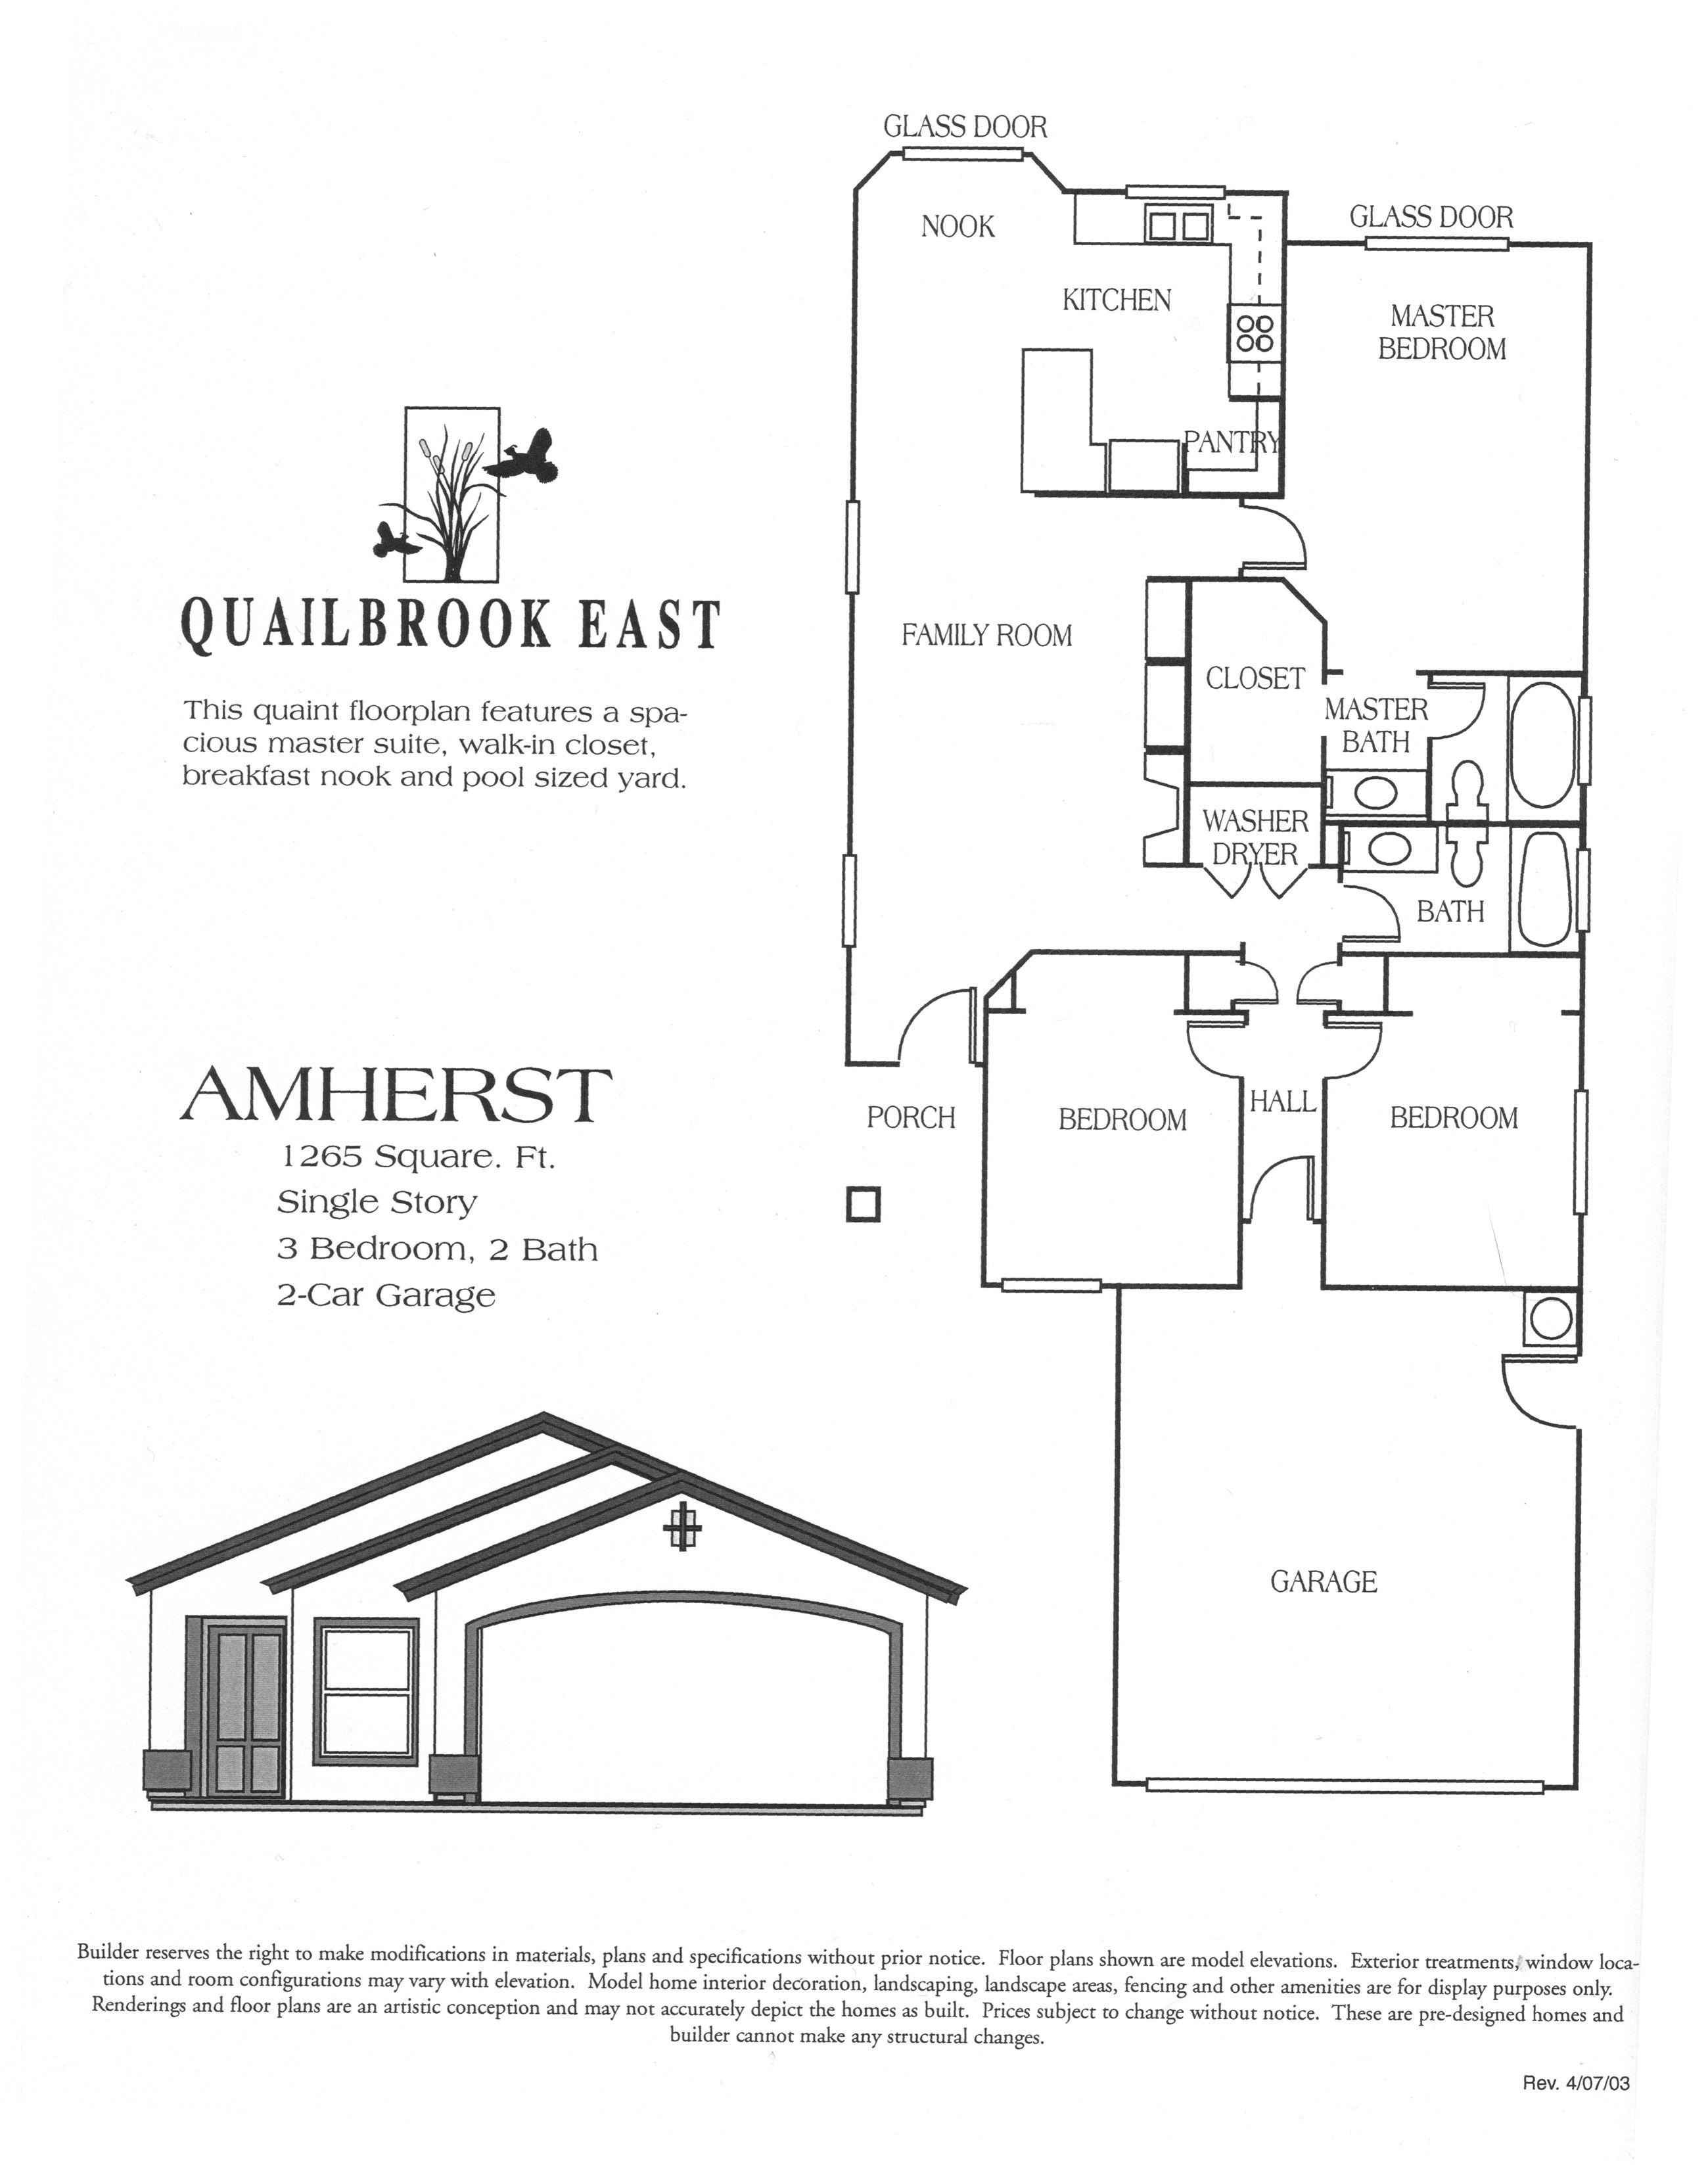 One Sheet Builder Elevation And Floor Plan For Housing Development Graphic Design Paul Cuthbert Floor Plans House Floor Plans Pool Sizes